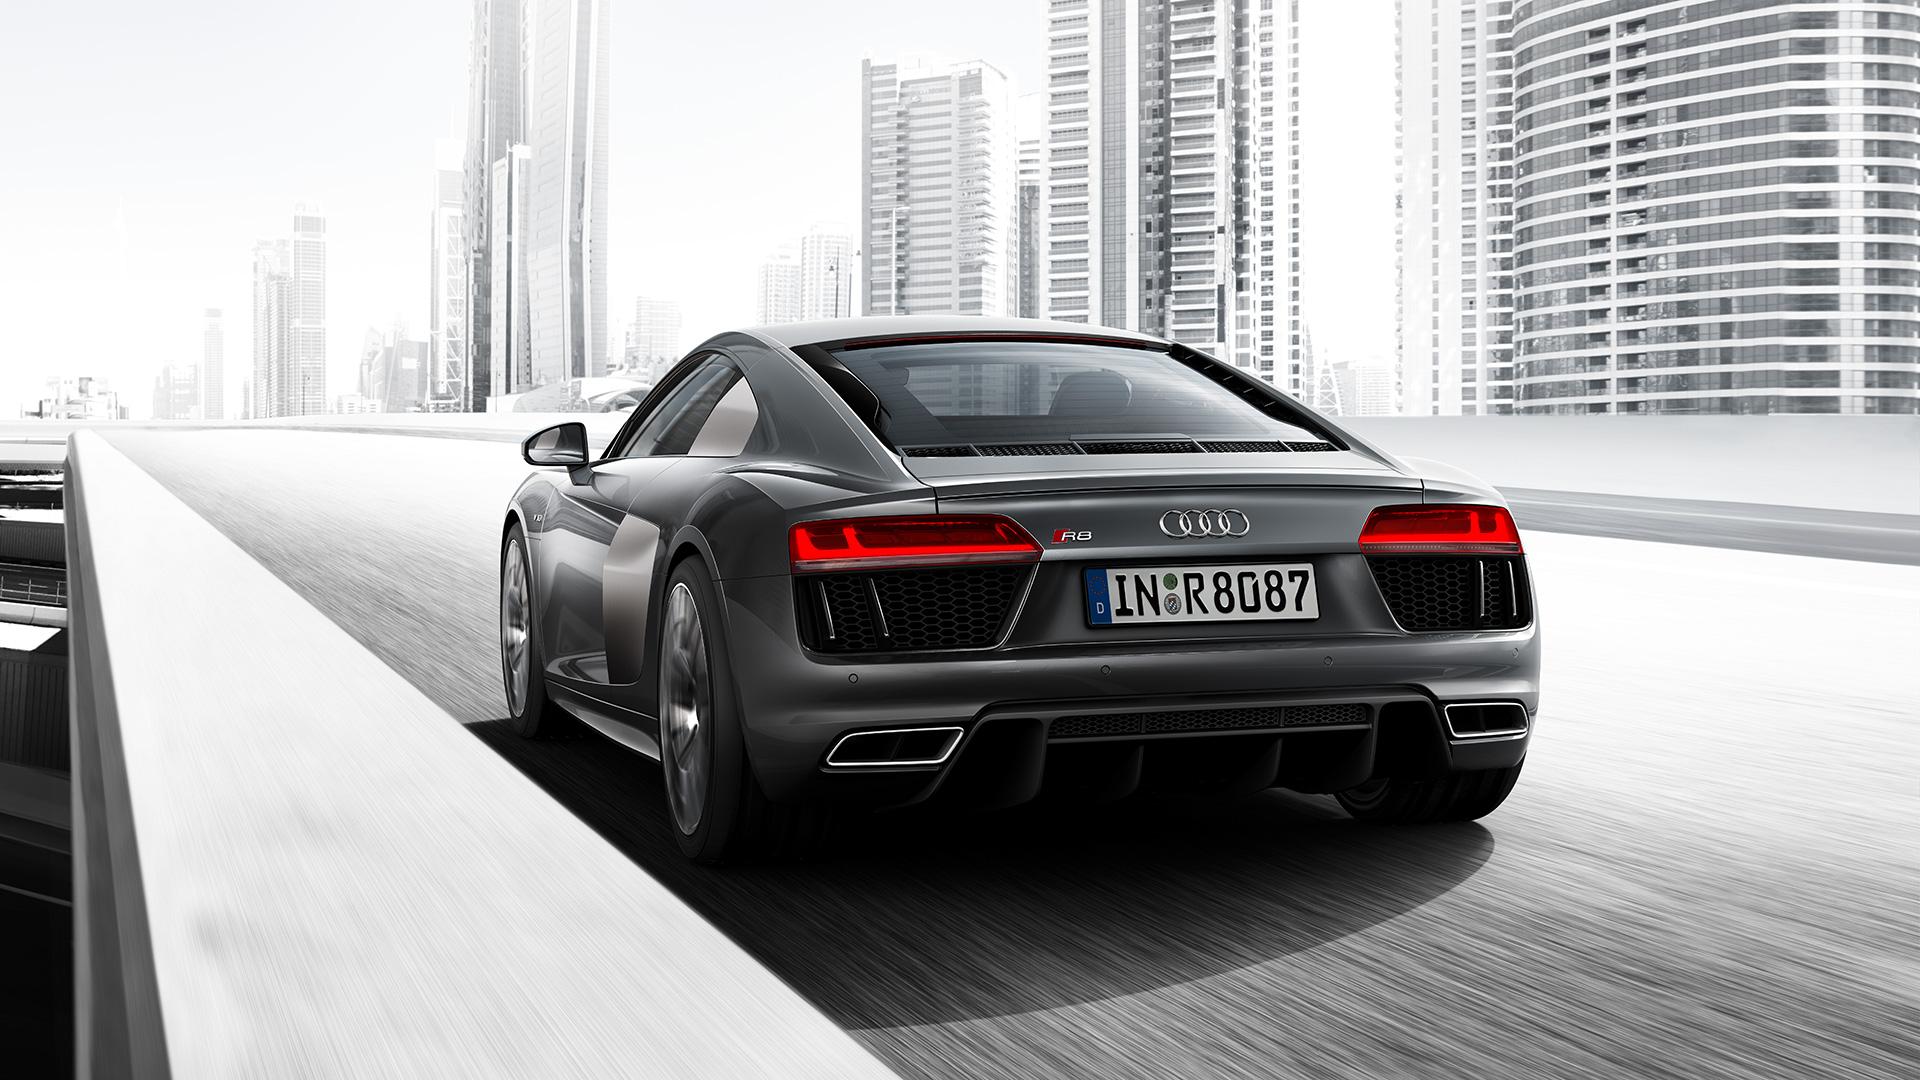 Kelebihan Kekurangan Audi R8 Coupé Murah Berkualitas